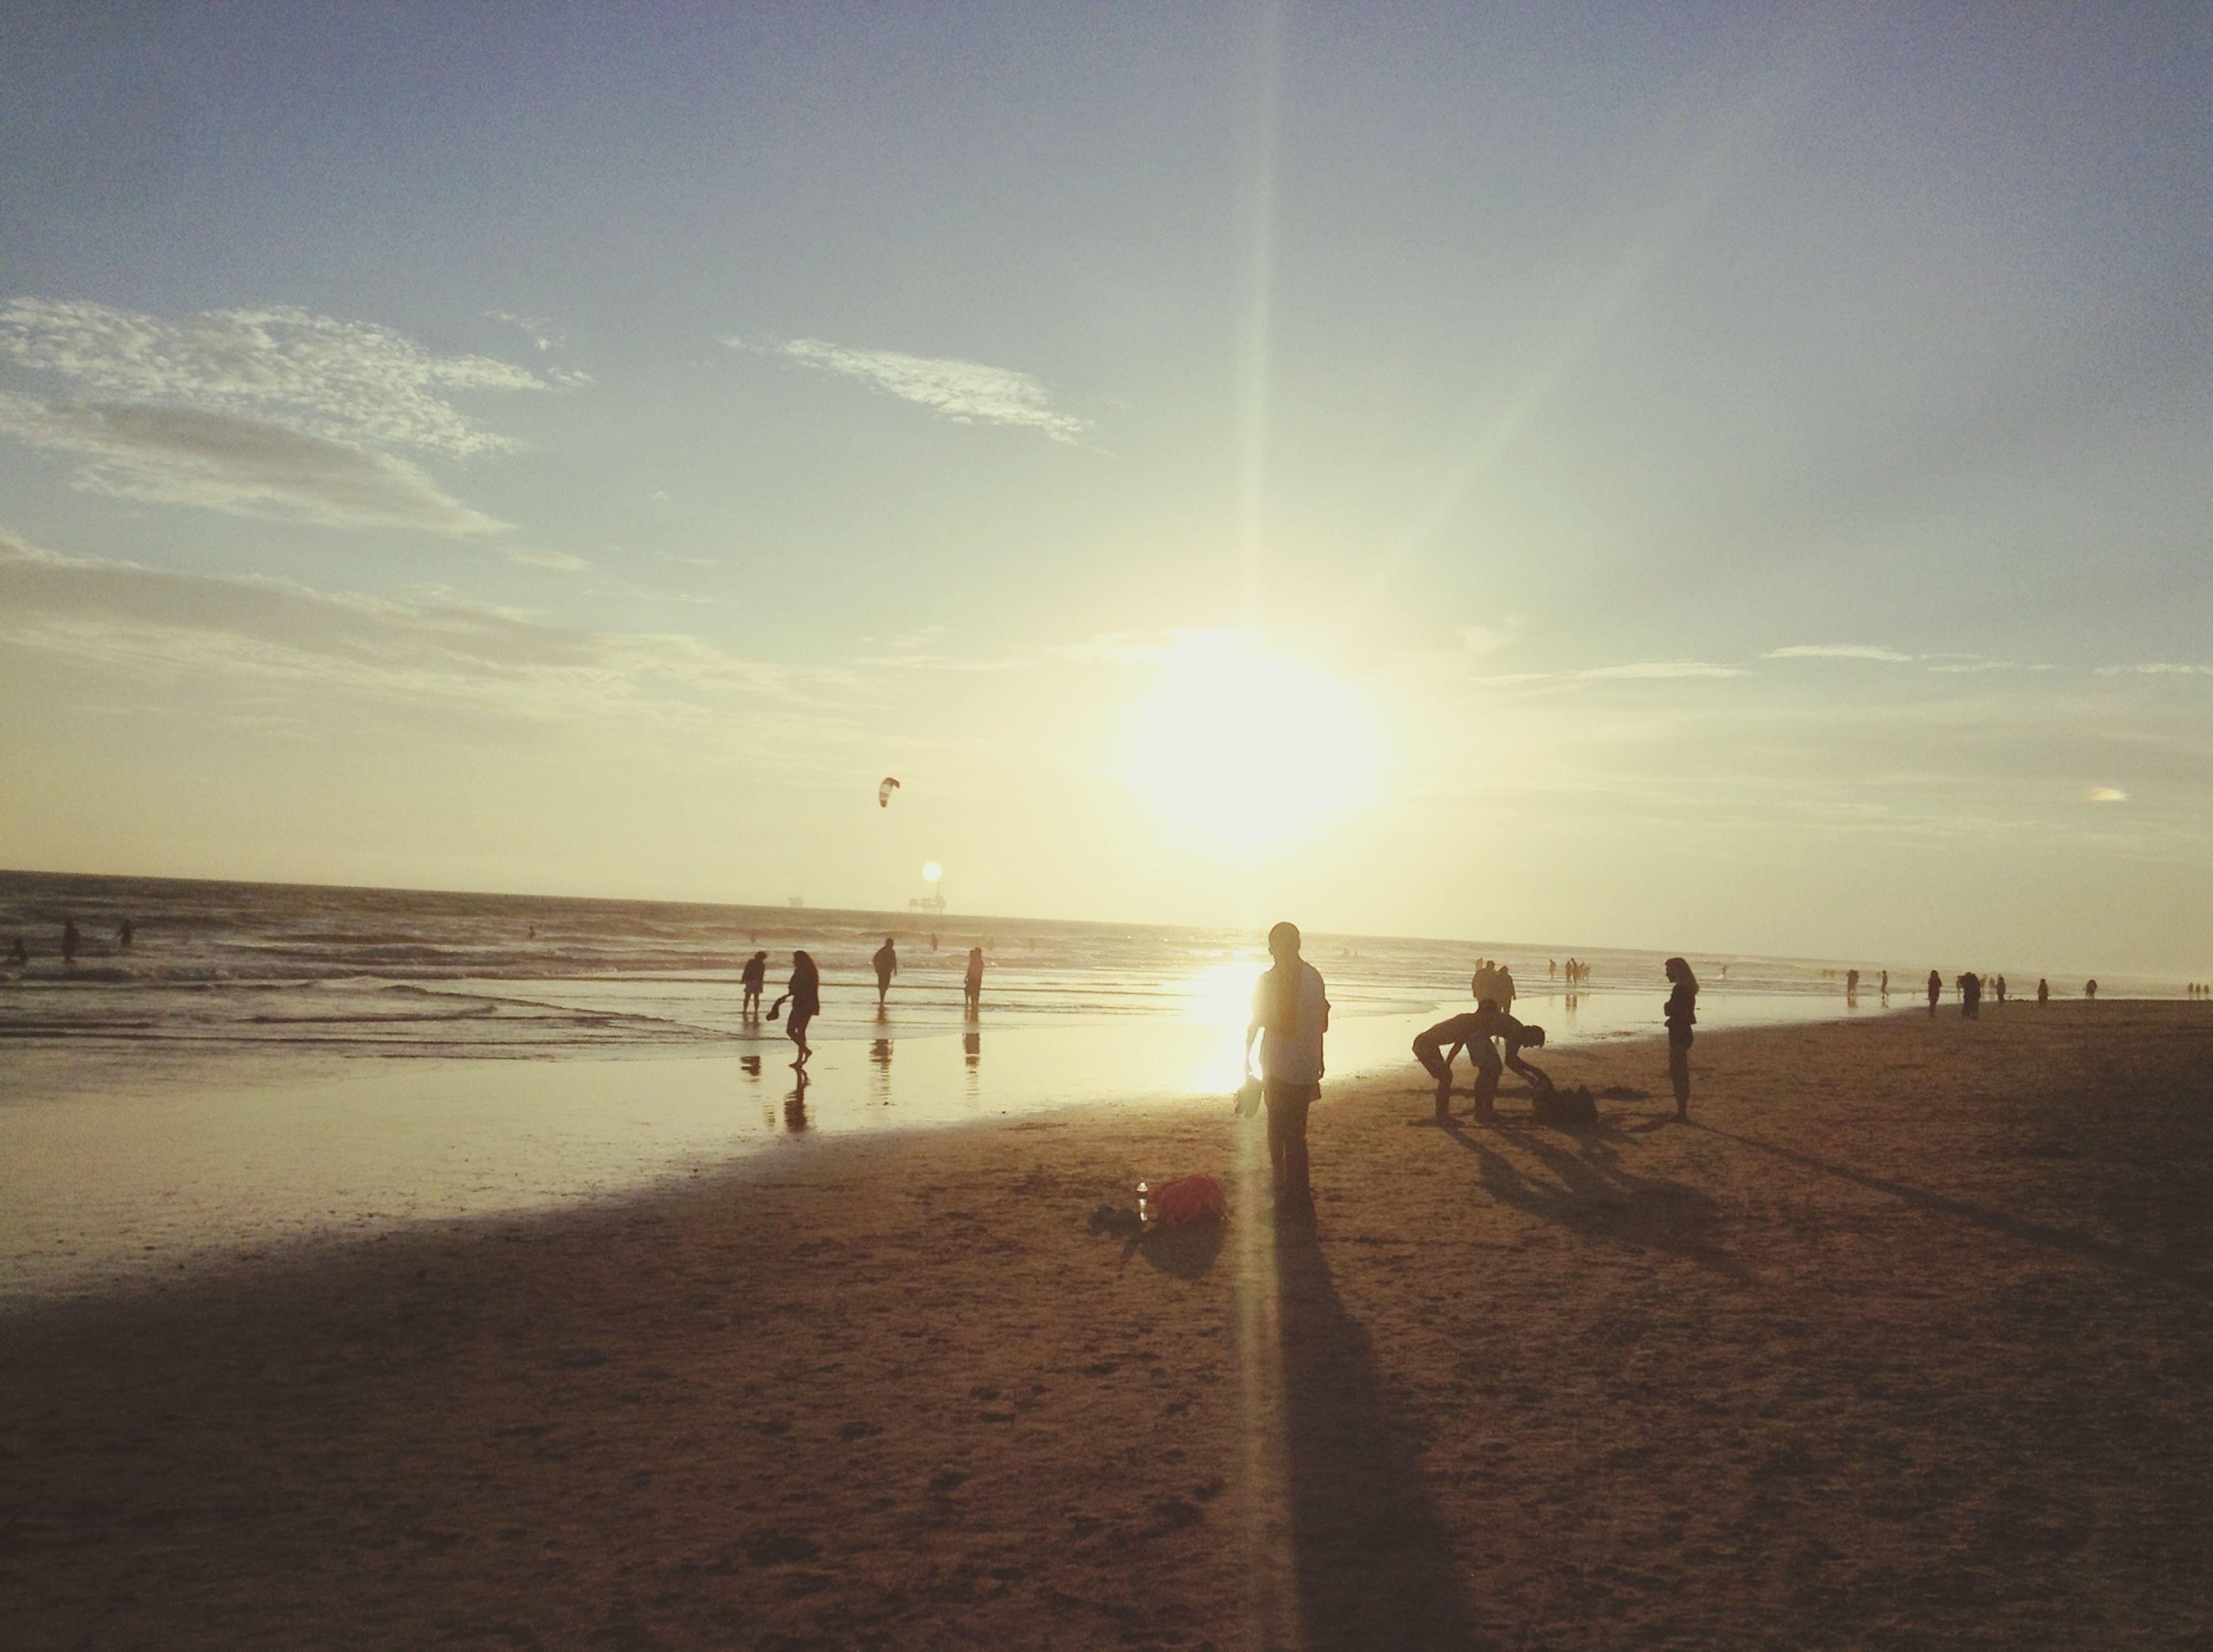 sea, beach, water, sun, horizon over water, leisure activity, shore, lifestyles, sunlight, sand, sunset, sky, vacations, sunbeam, large group of people, scenics, men, medium group of people, person